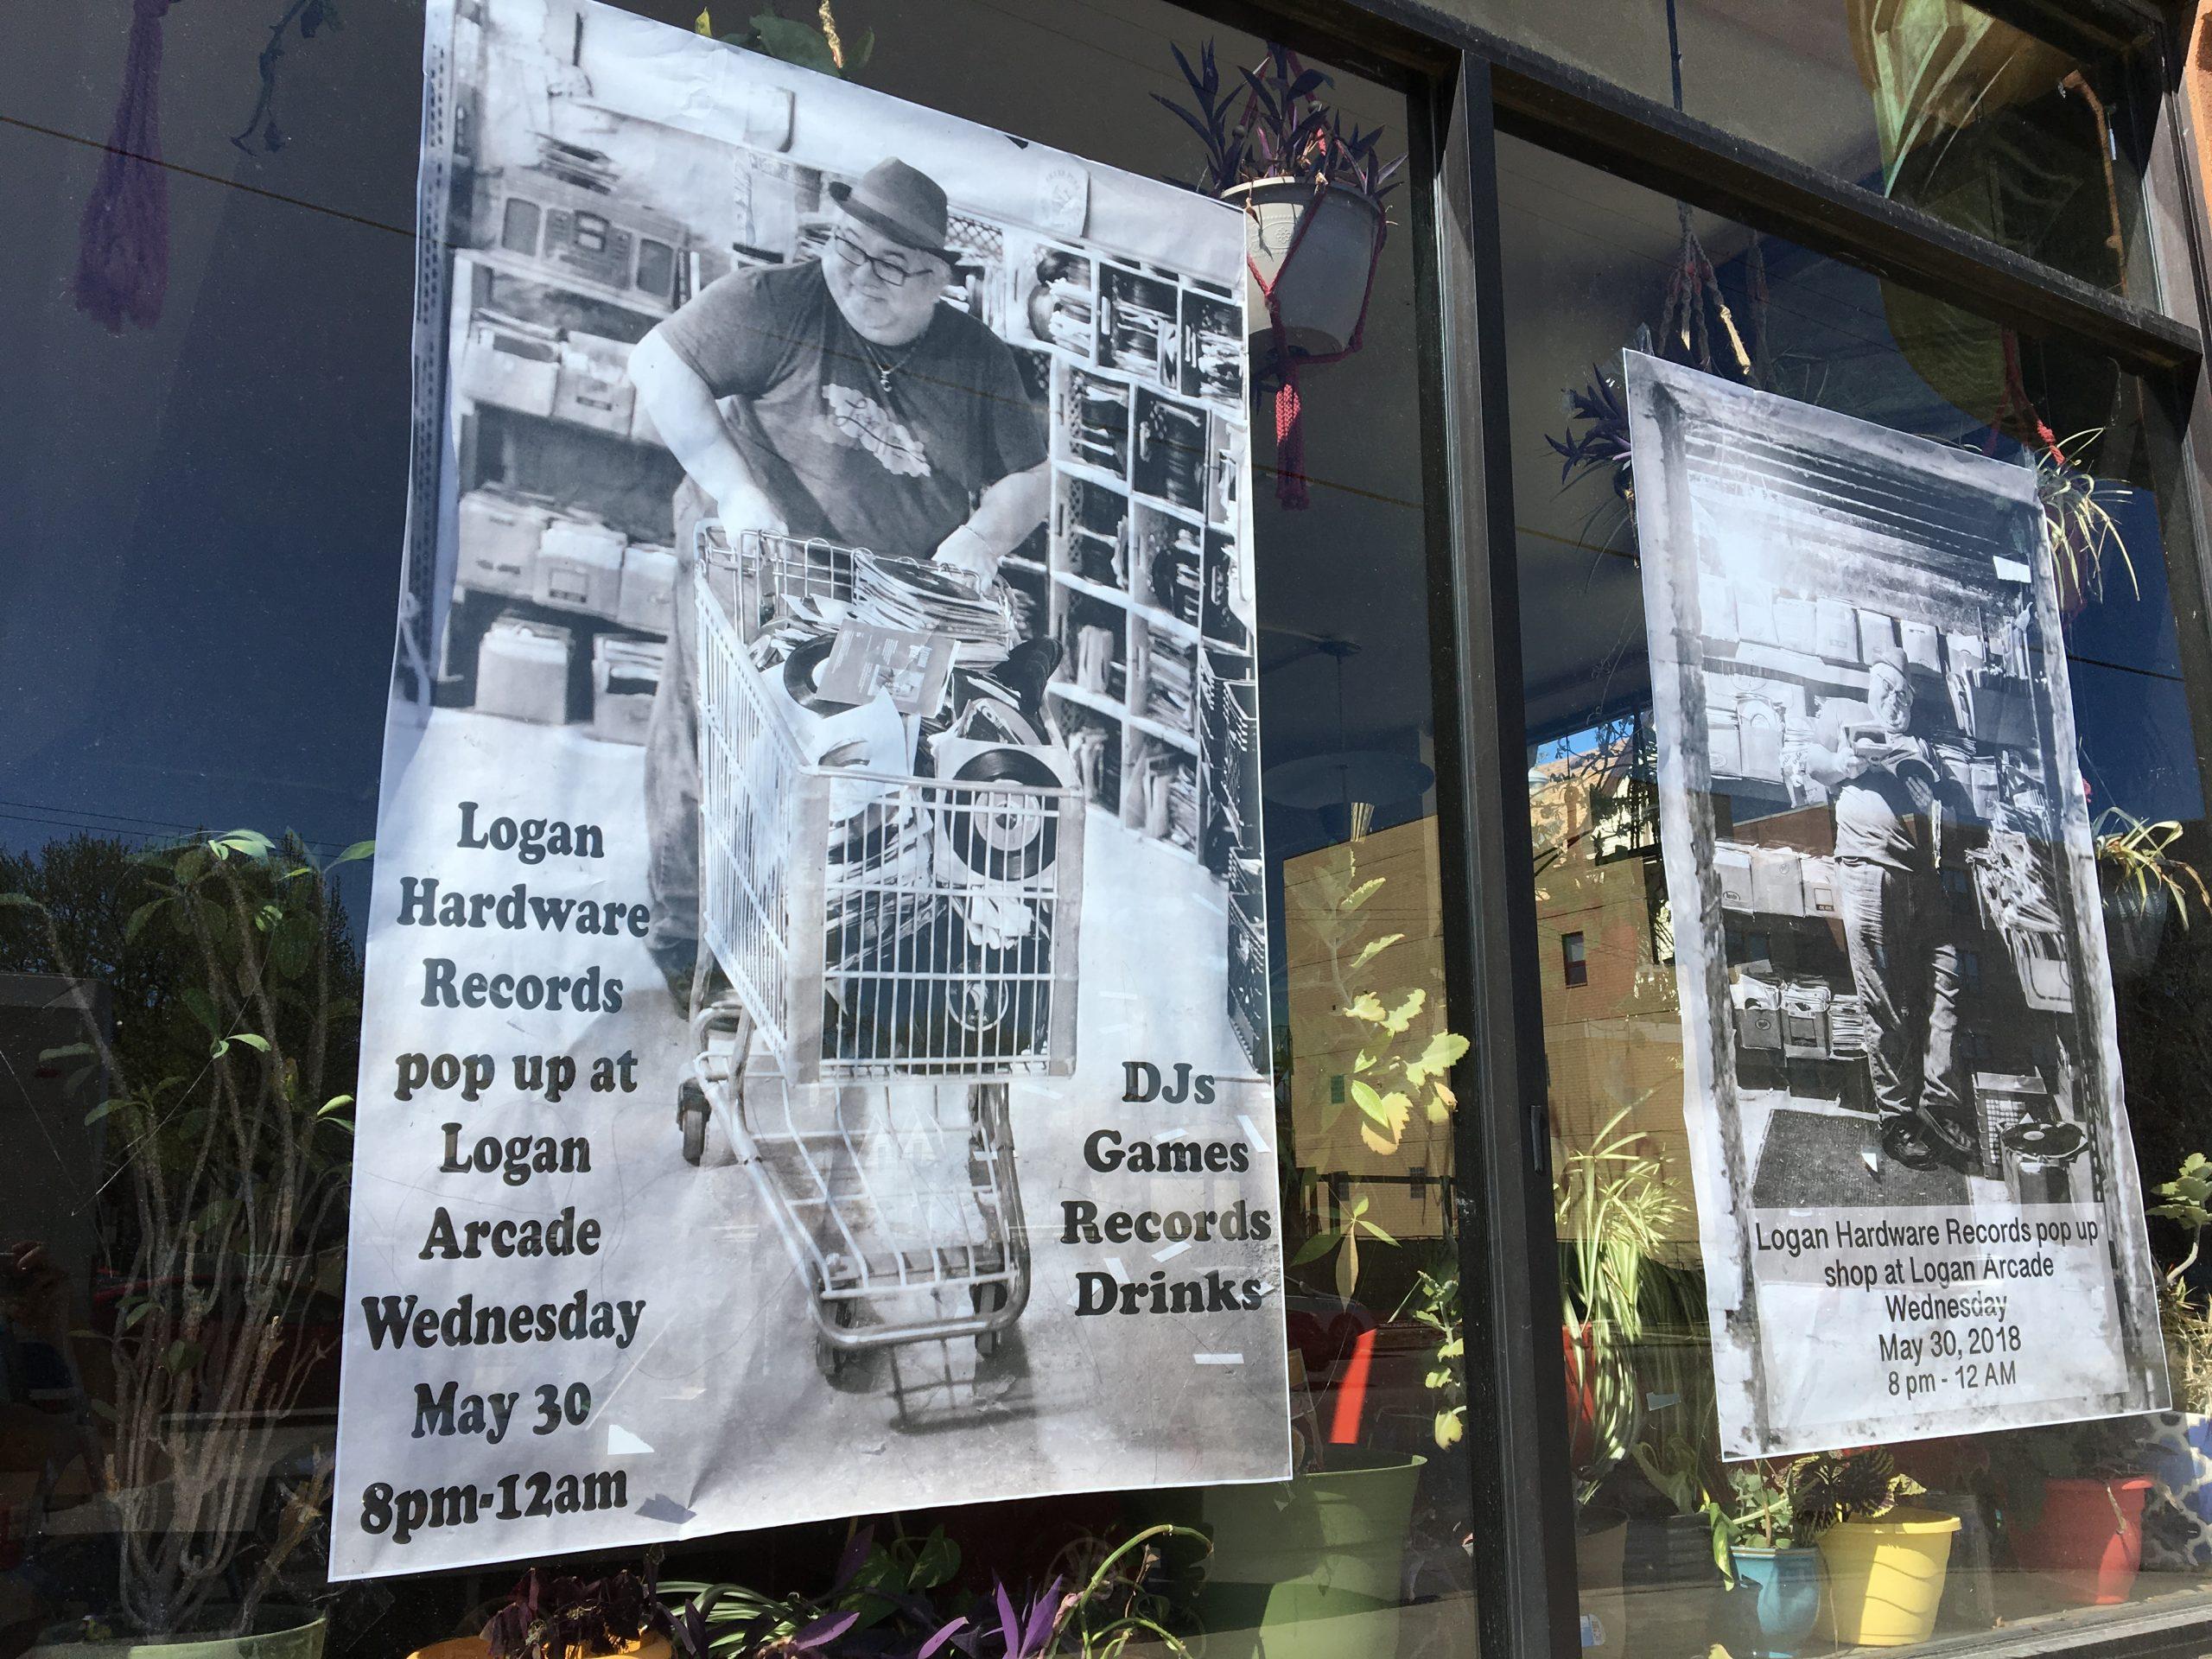 Promotional posters for Logan Hardware's upcoming pop-up shop at Logan Arcade featuring shop employee and DJ Jivan Ivan.